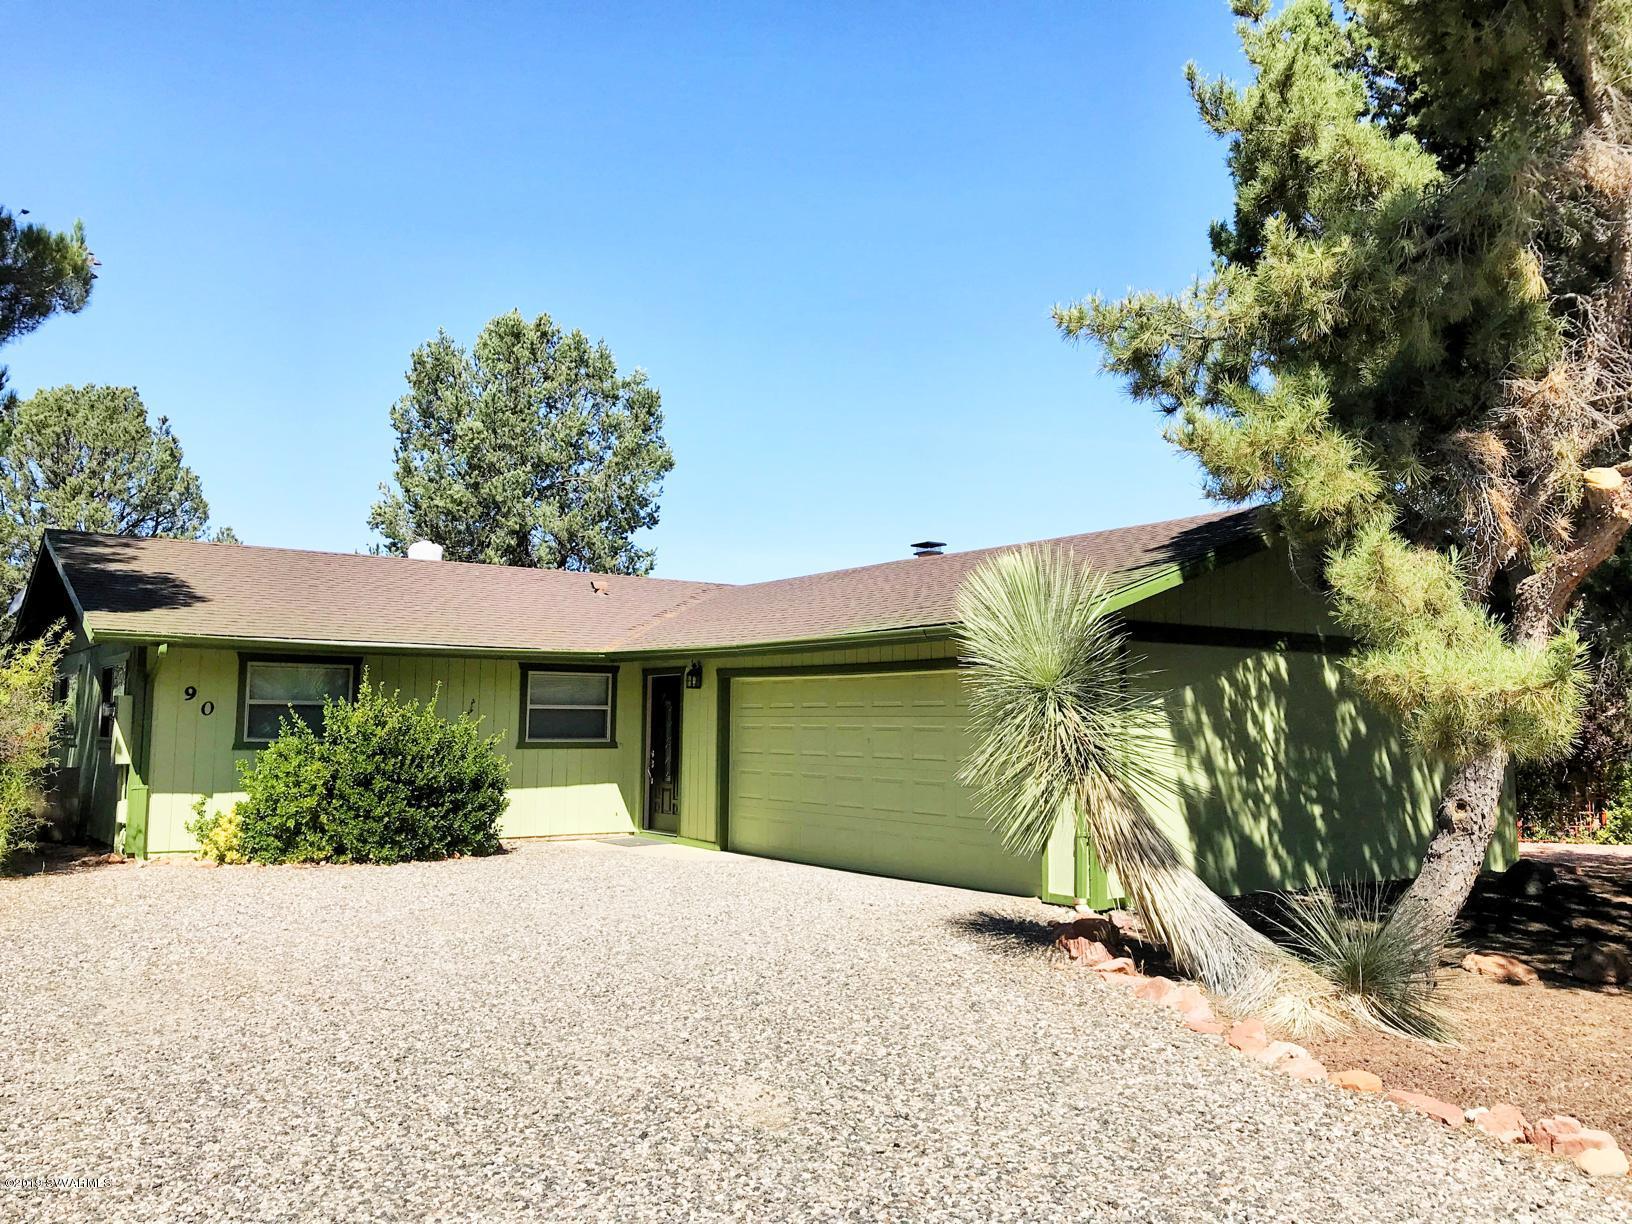 90 Palo Verde Circle Sedona, AZ 86351